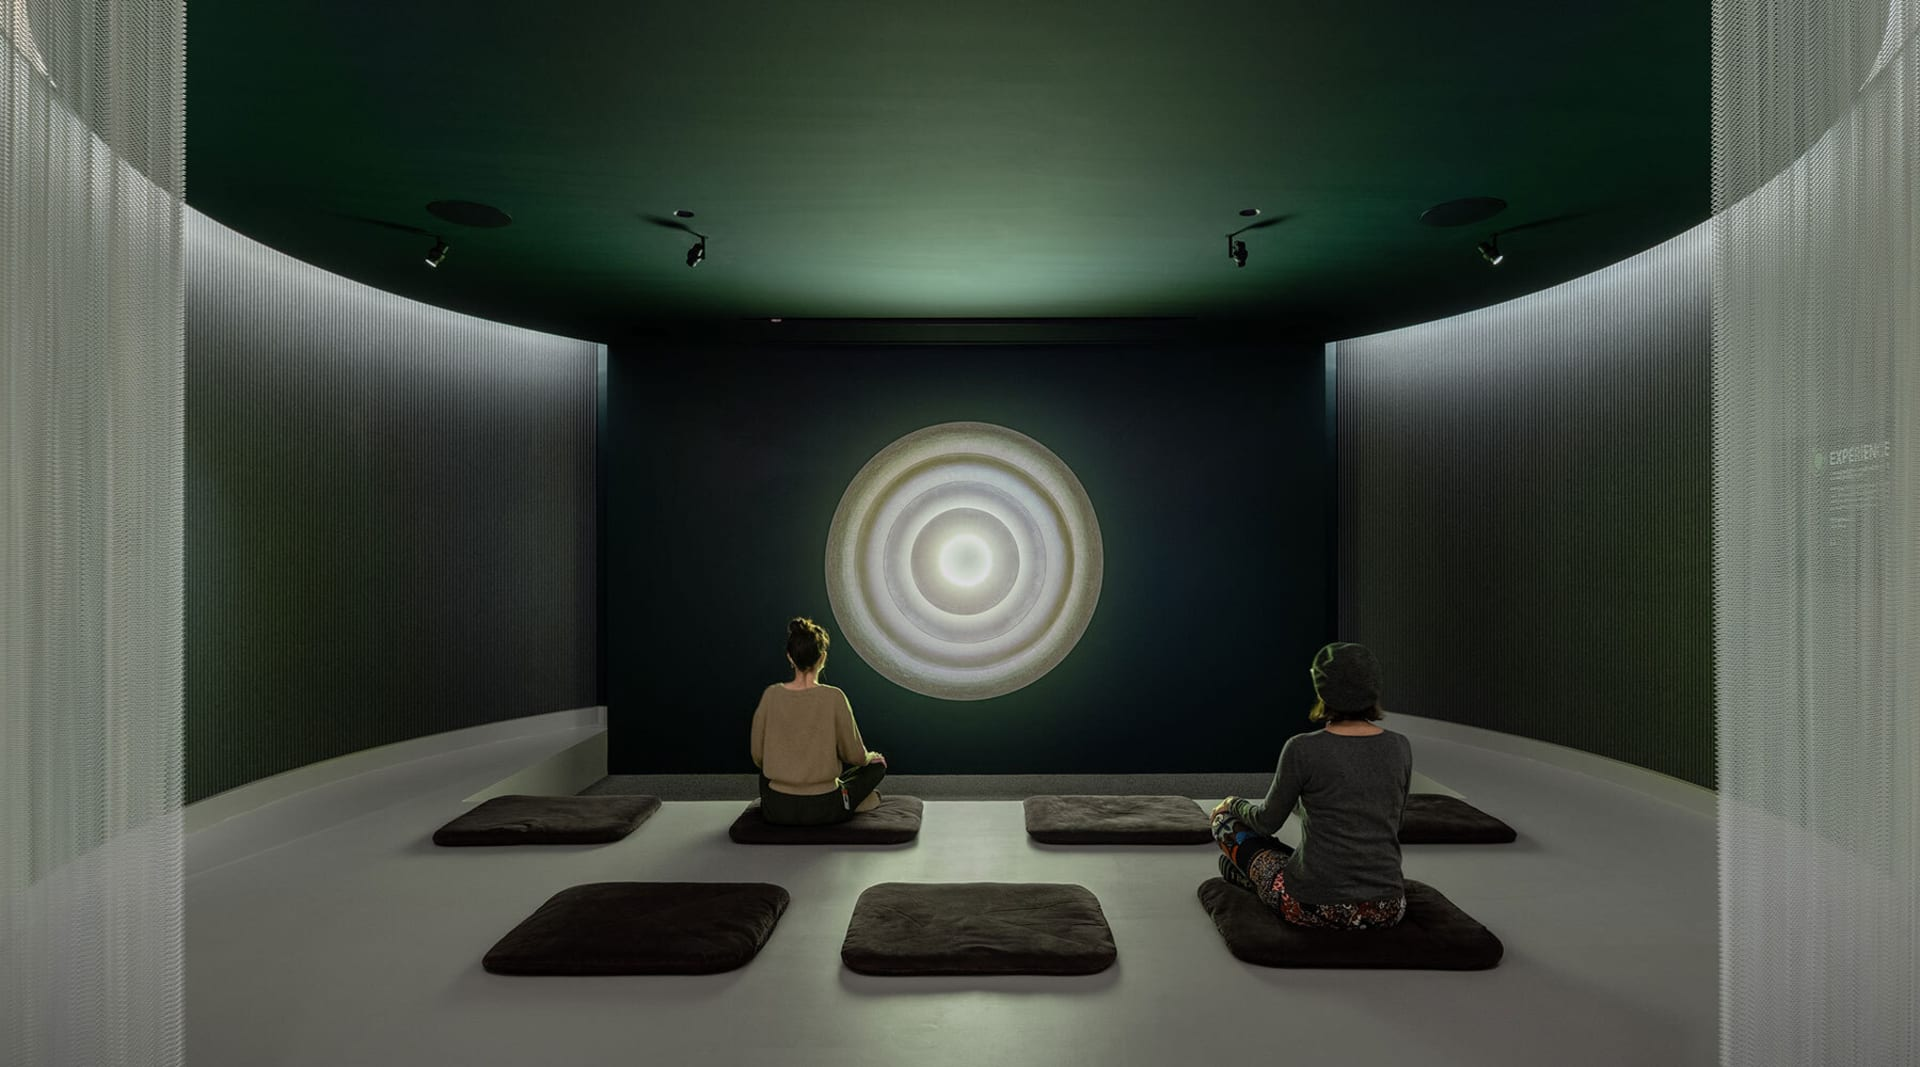 HERO PRO Mandala Lab 0125 by Rafael Gamo courtesy of the Rubin Museum of Art Peterson Rich Office